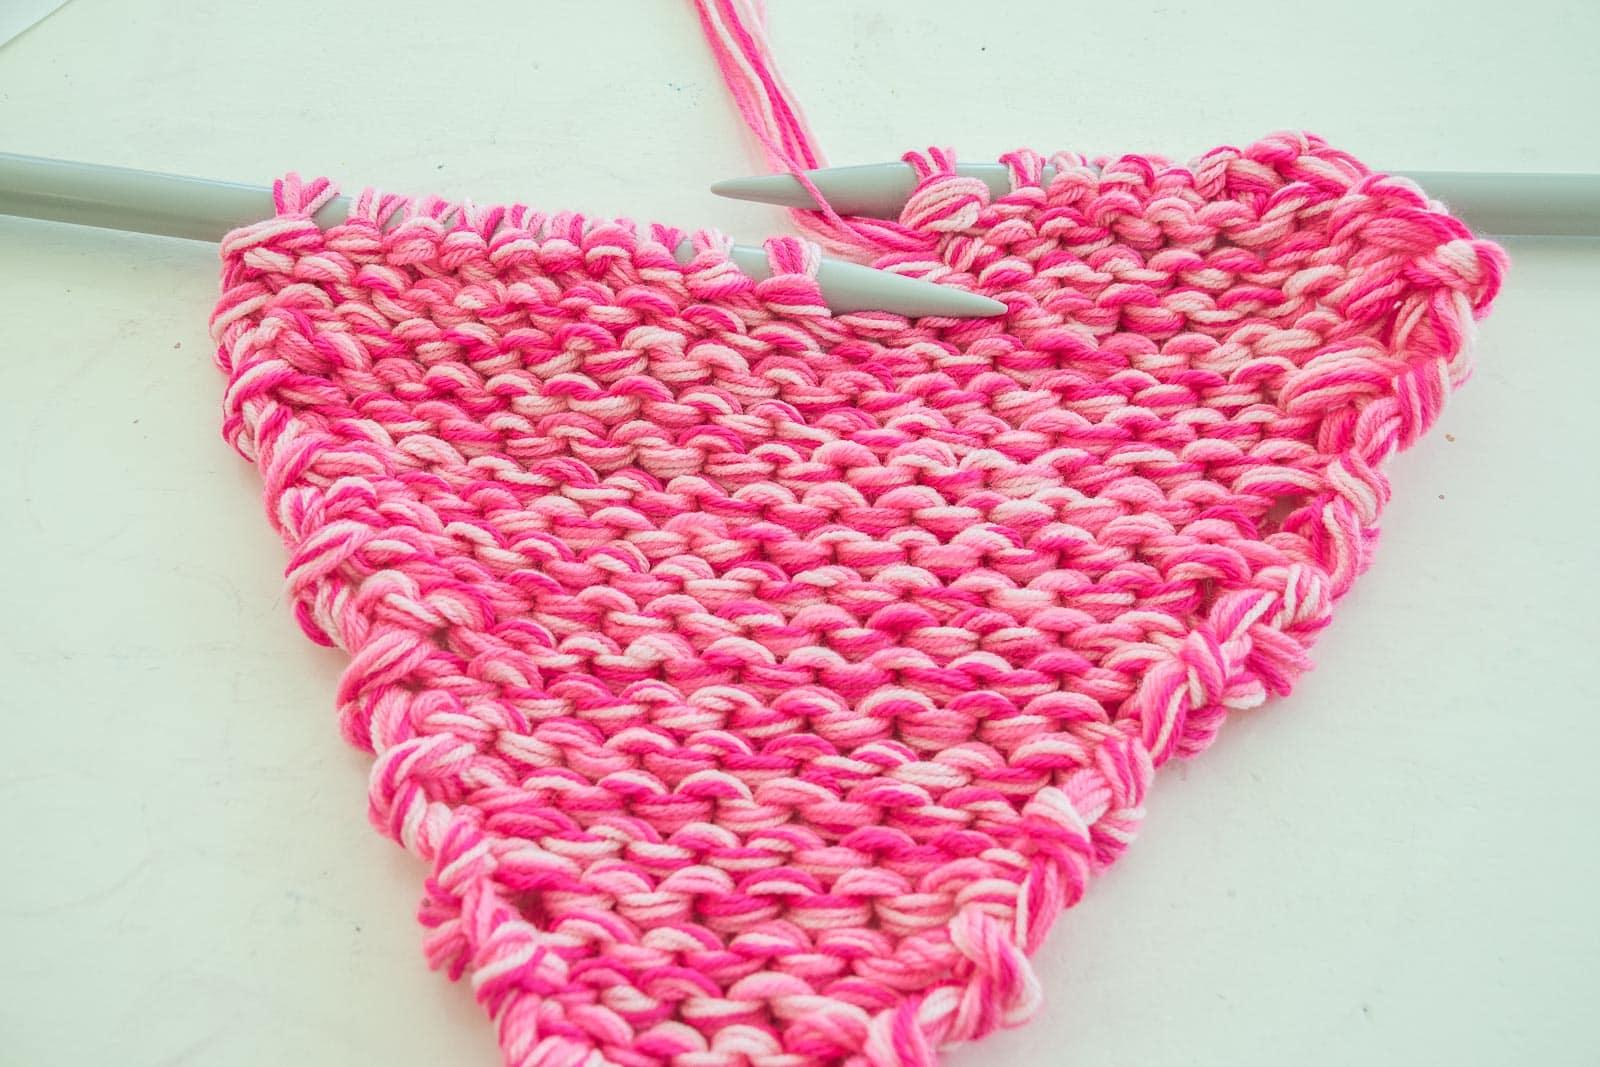 split the yarn on two needles